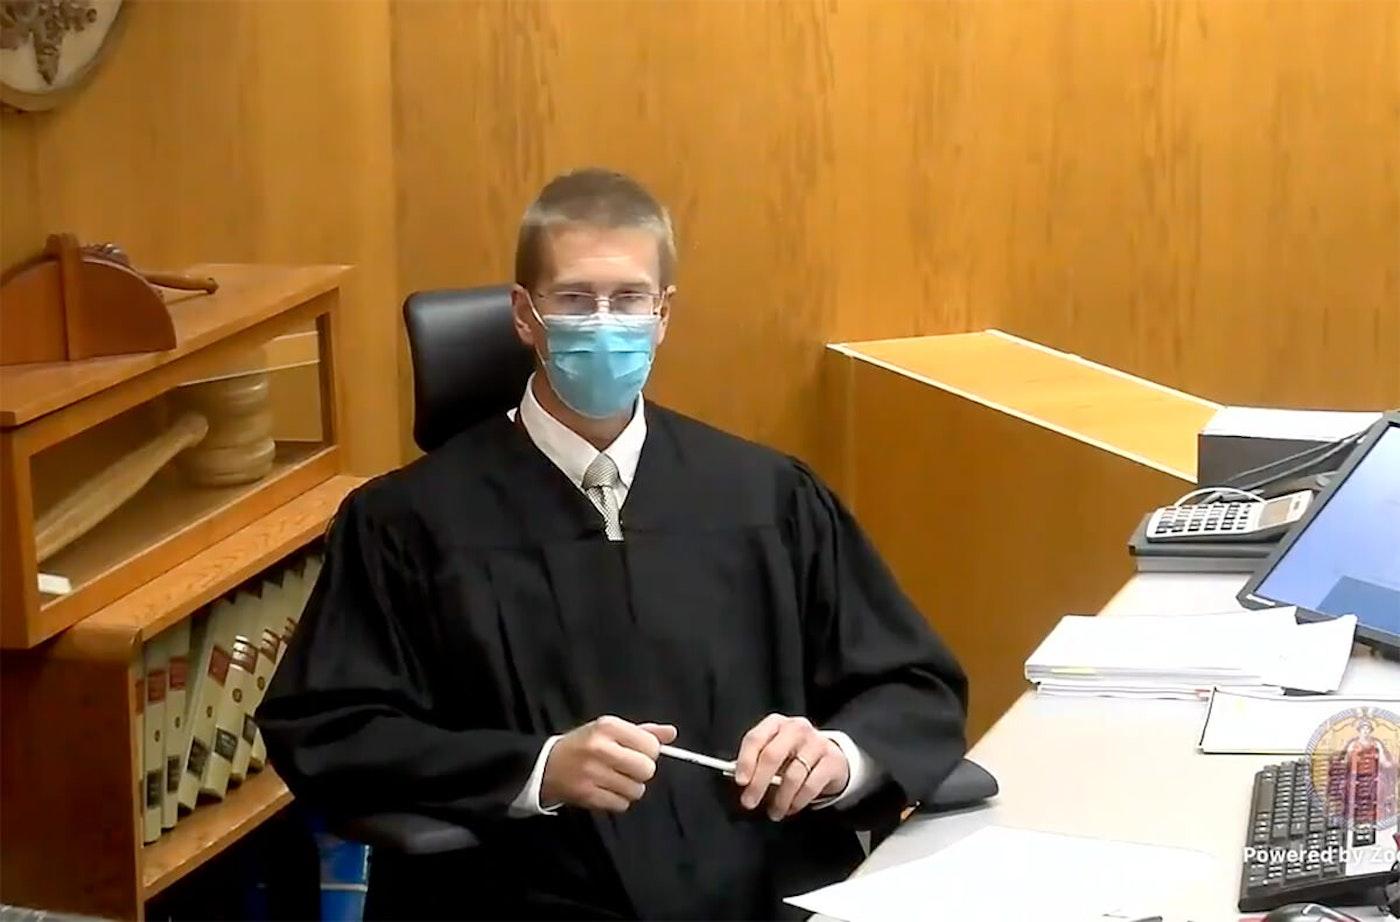 St. Croix County Circuit Court Judge Michael Waterman